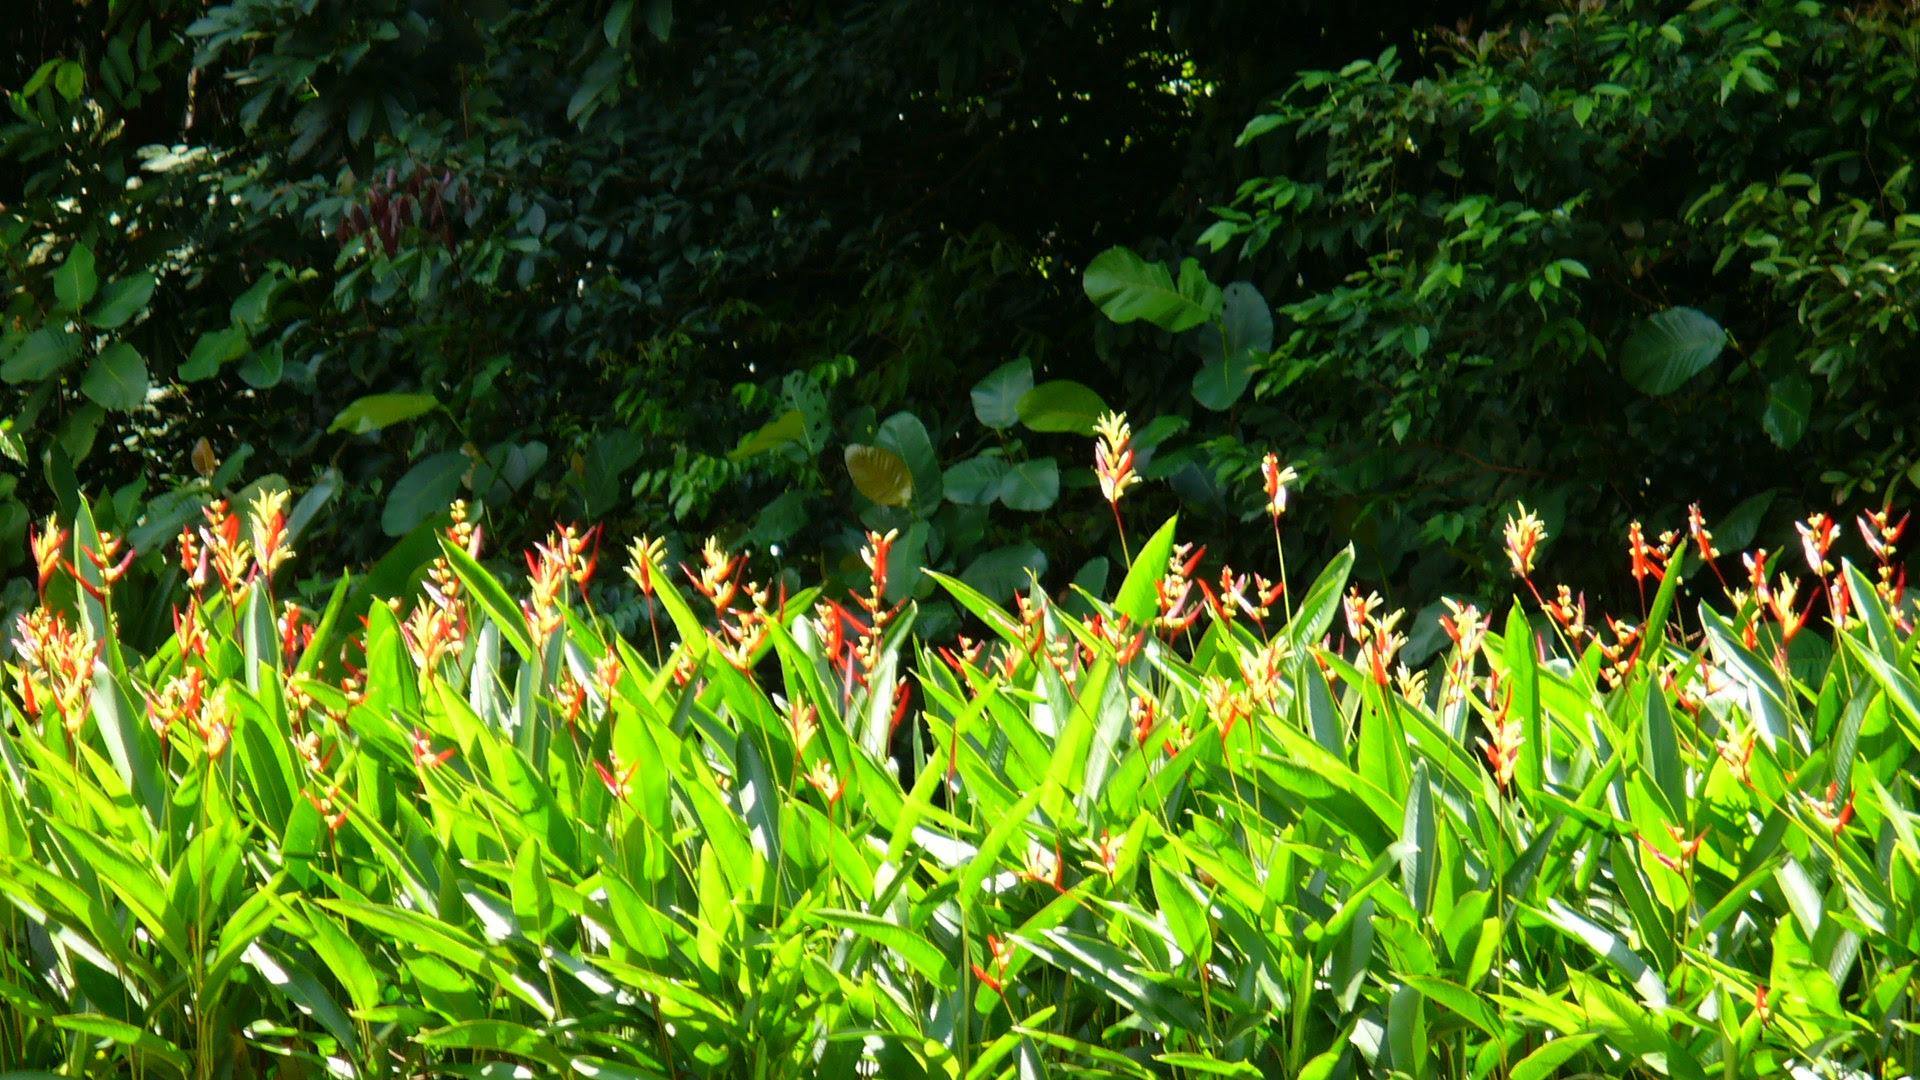 Flowers in Bloom - Singapore Botanic Gardens